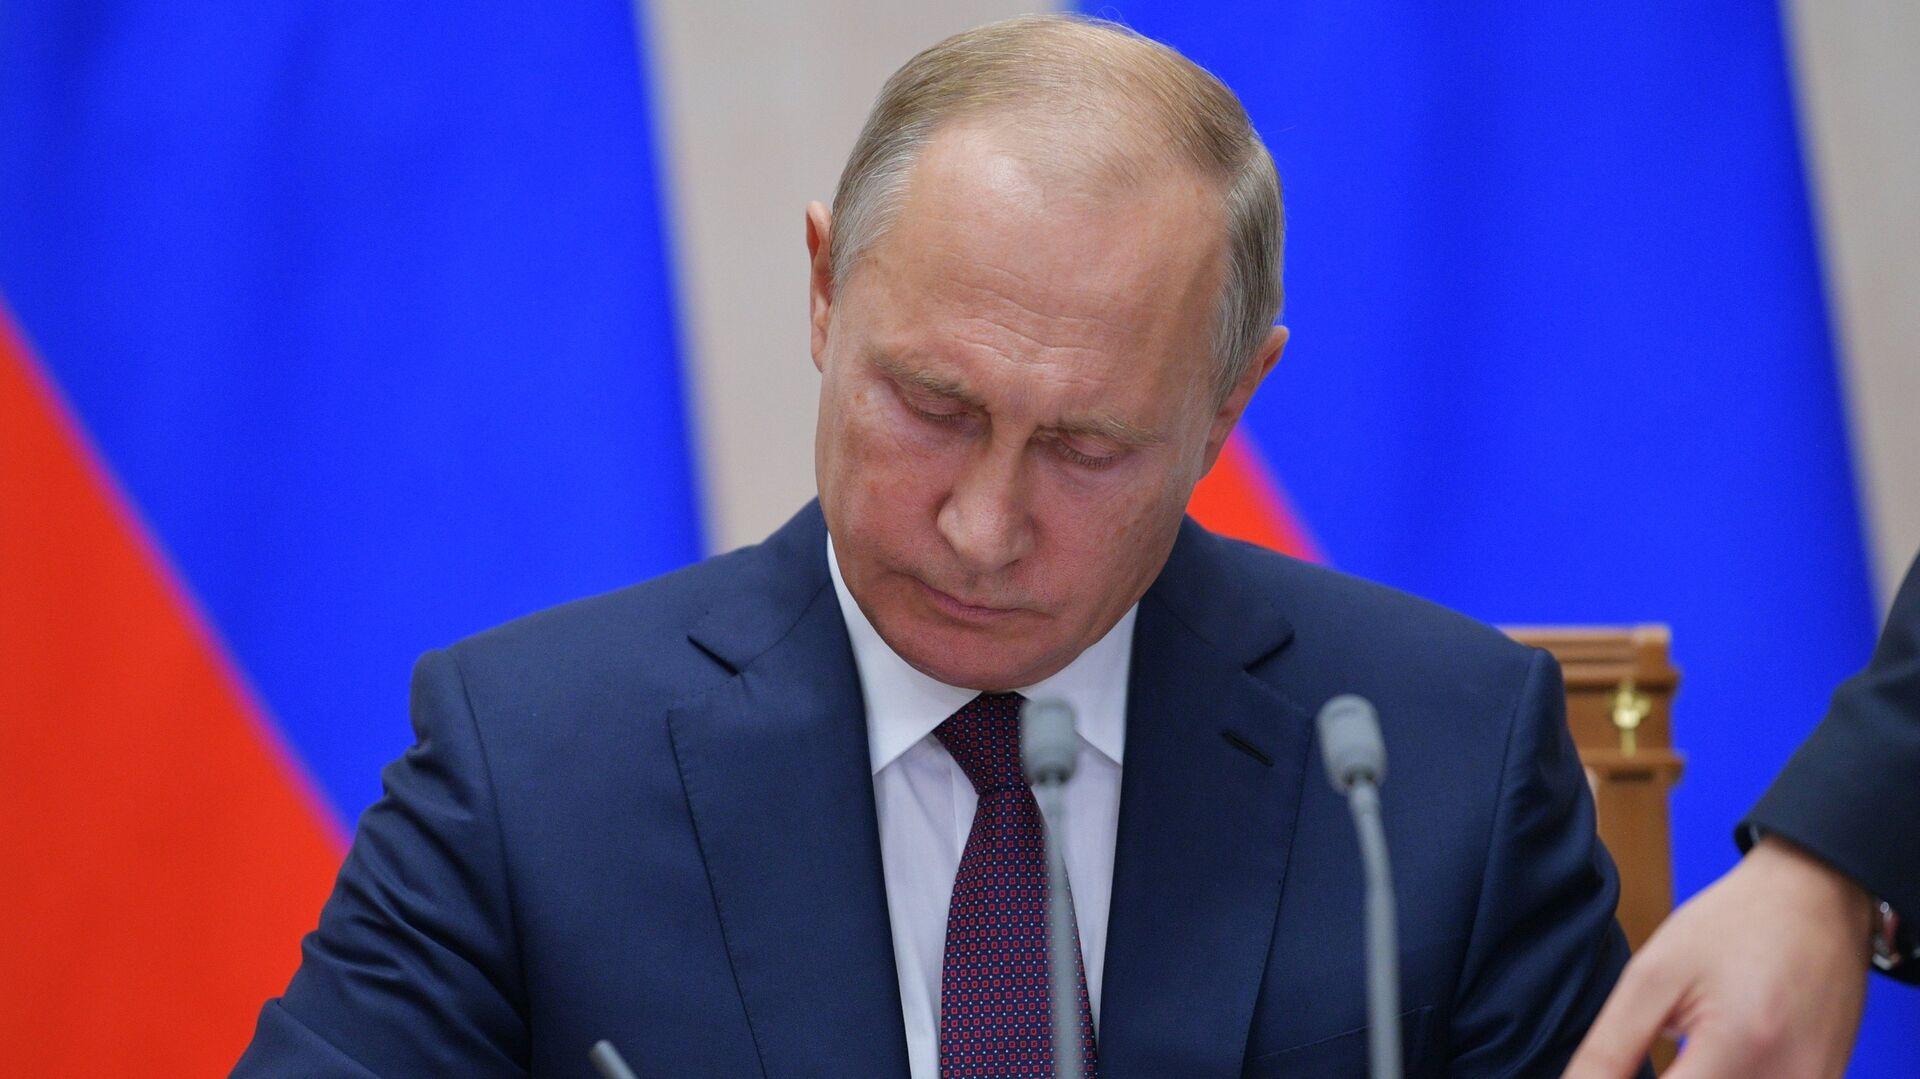 Vladímir Putin, presidente de Rusia - Sputnik Mundo, 1920, 30.04.2021